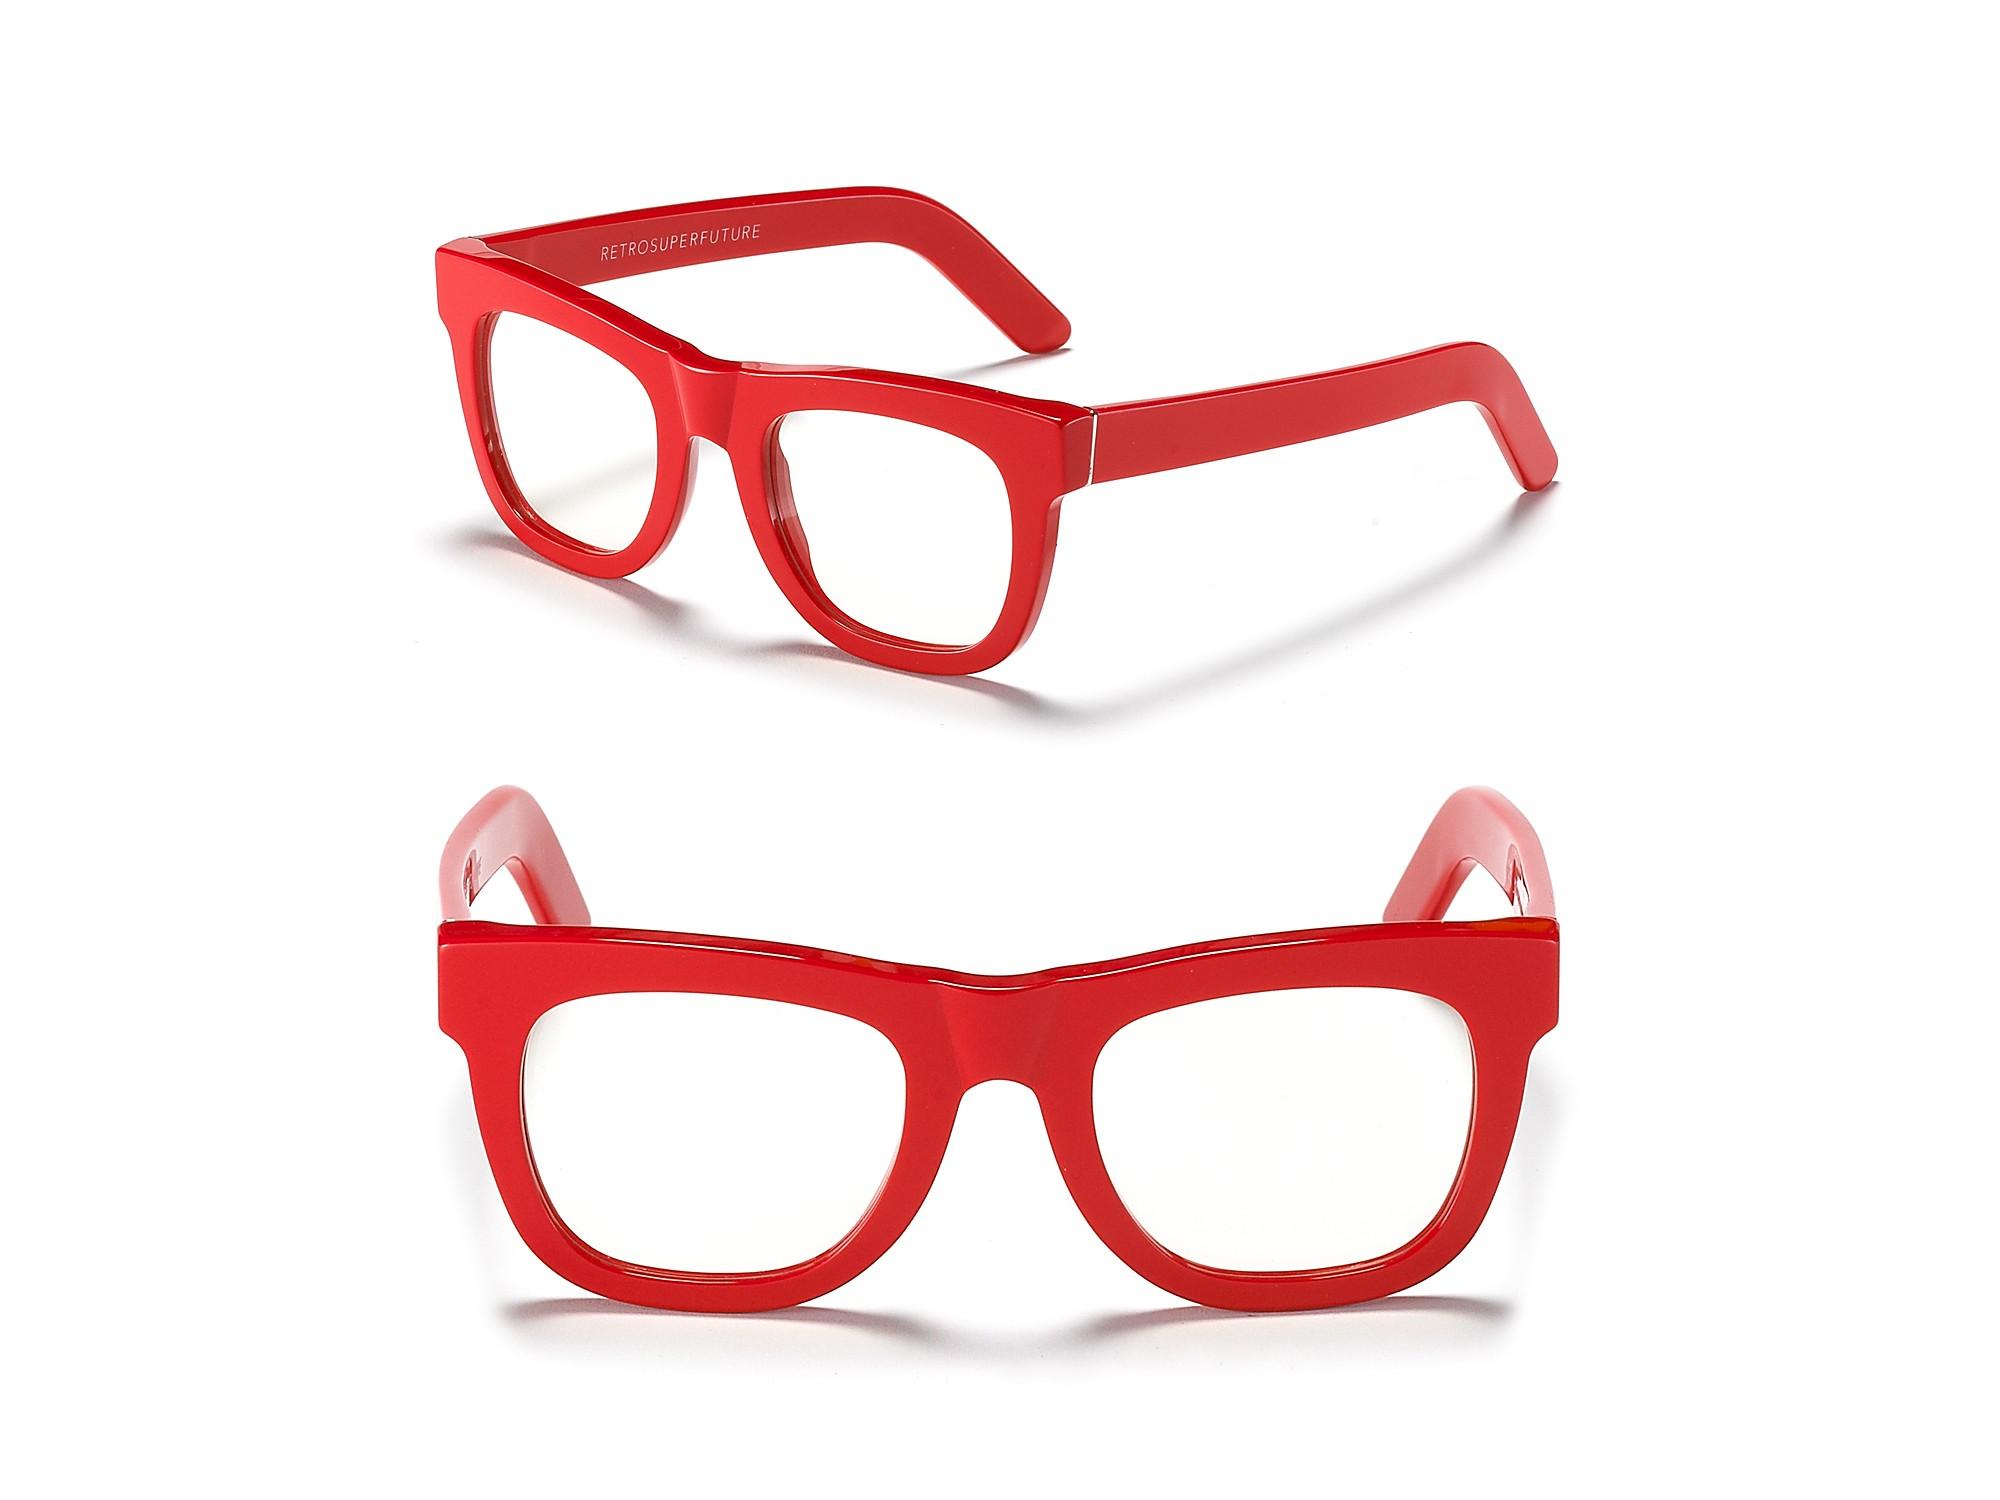 Lyst - Retrosuperfuture Ciocio Clear Frame Glasses in Red